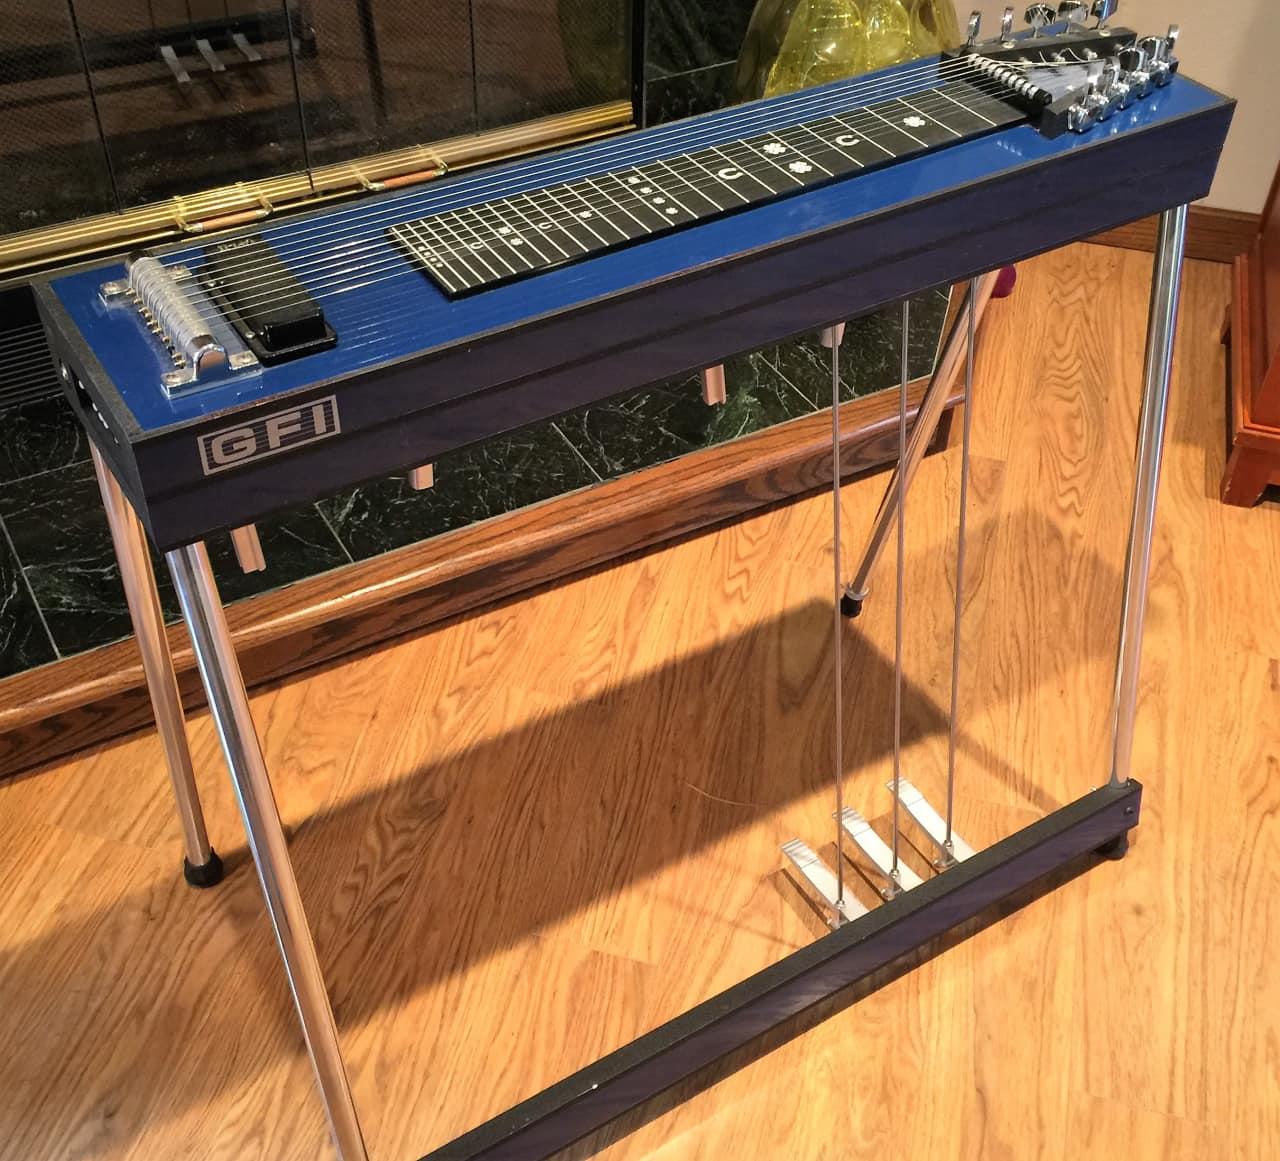 gfi s 10 blue 3x4 pedal steel guitar w extras reverb. Black Bedroom Furniture Sets. Home Design Ideas